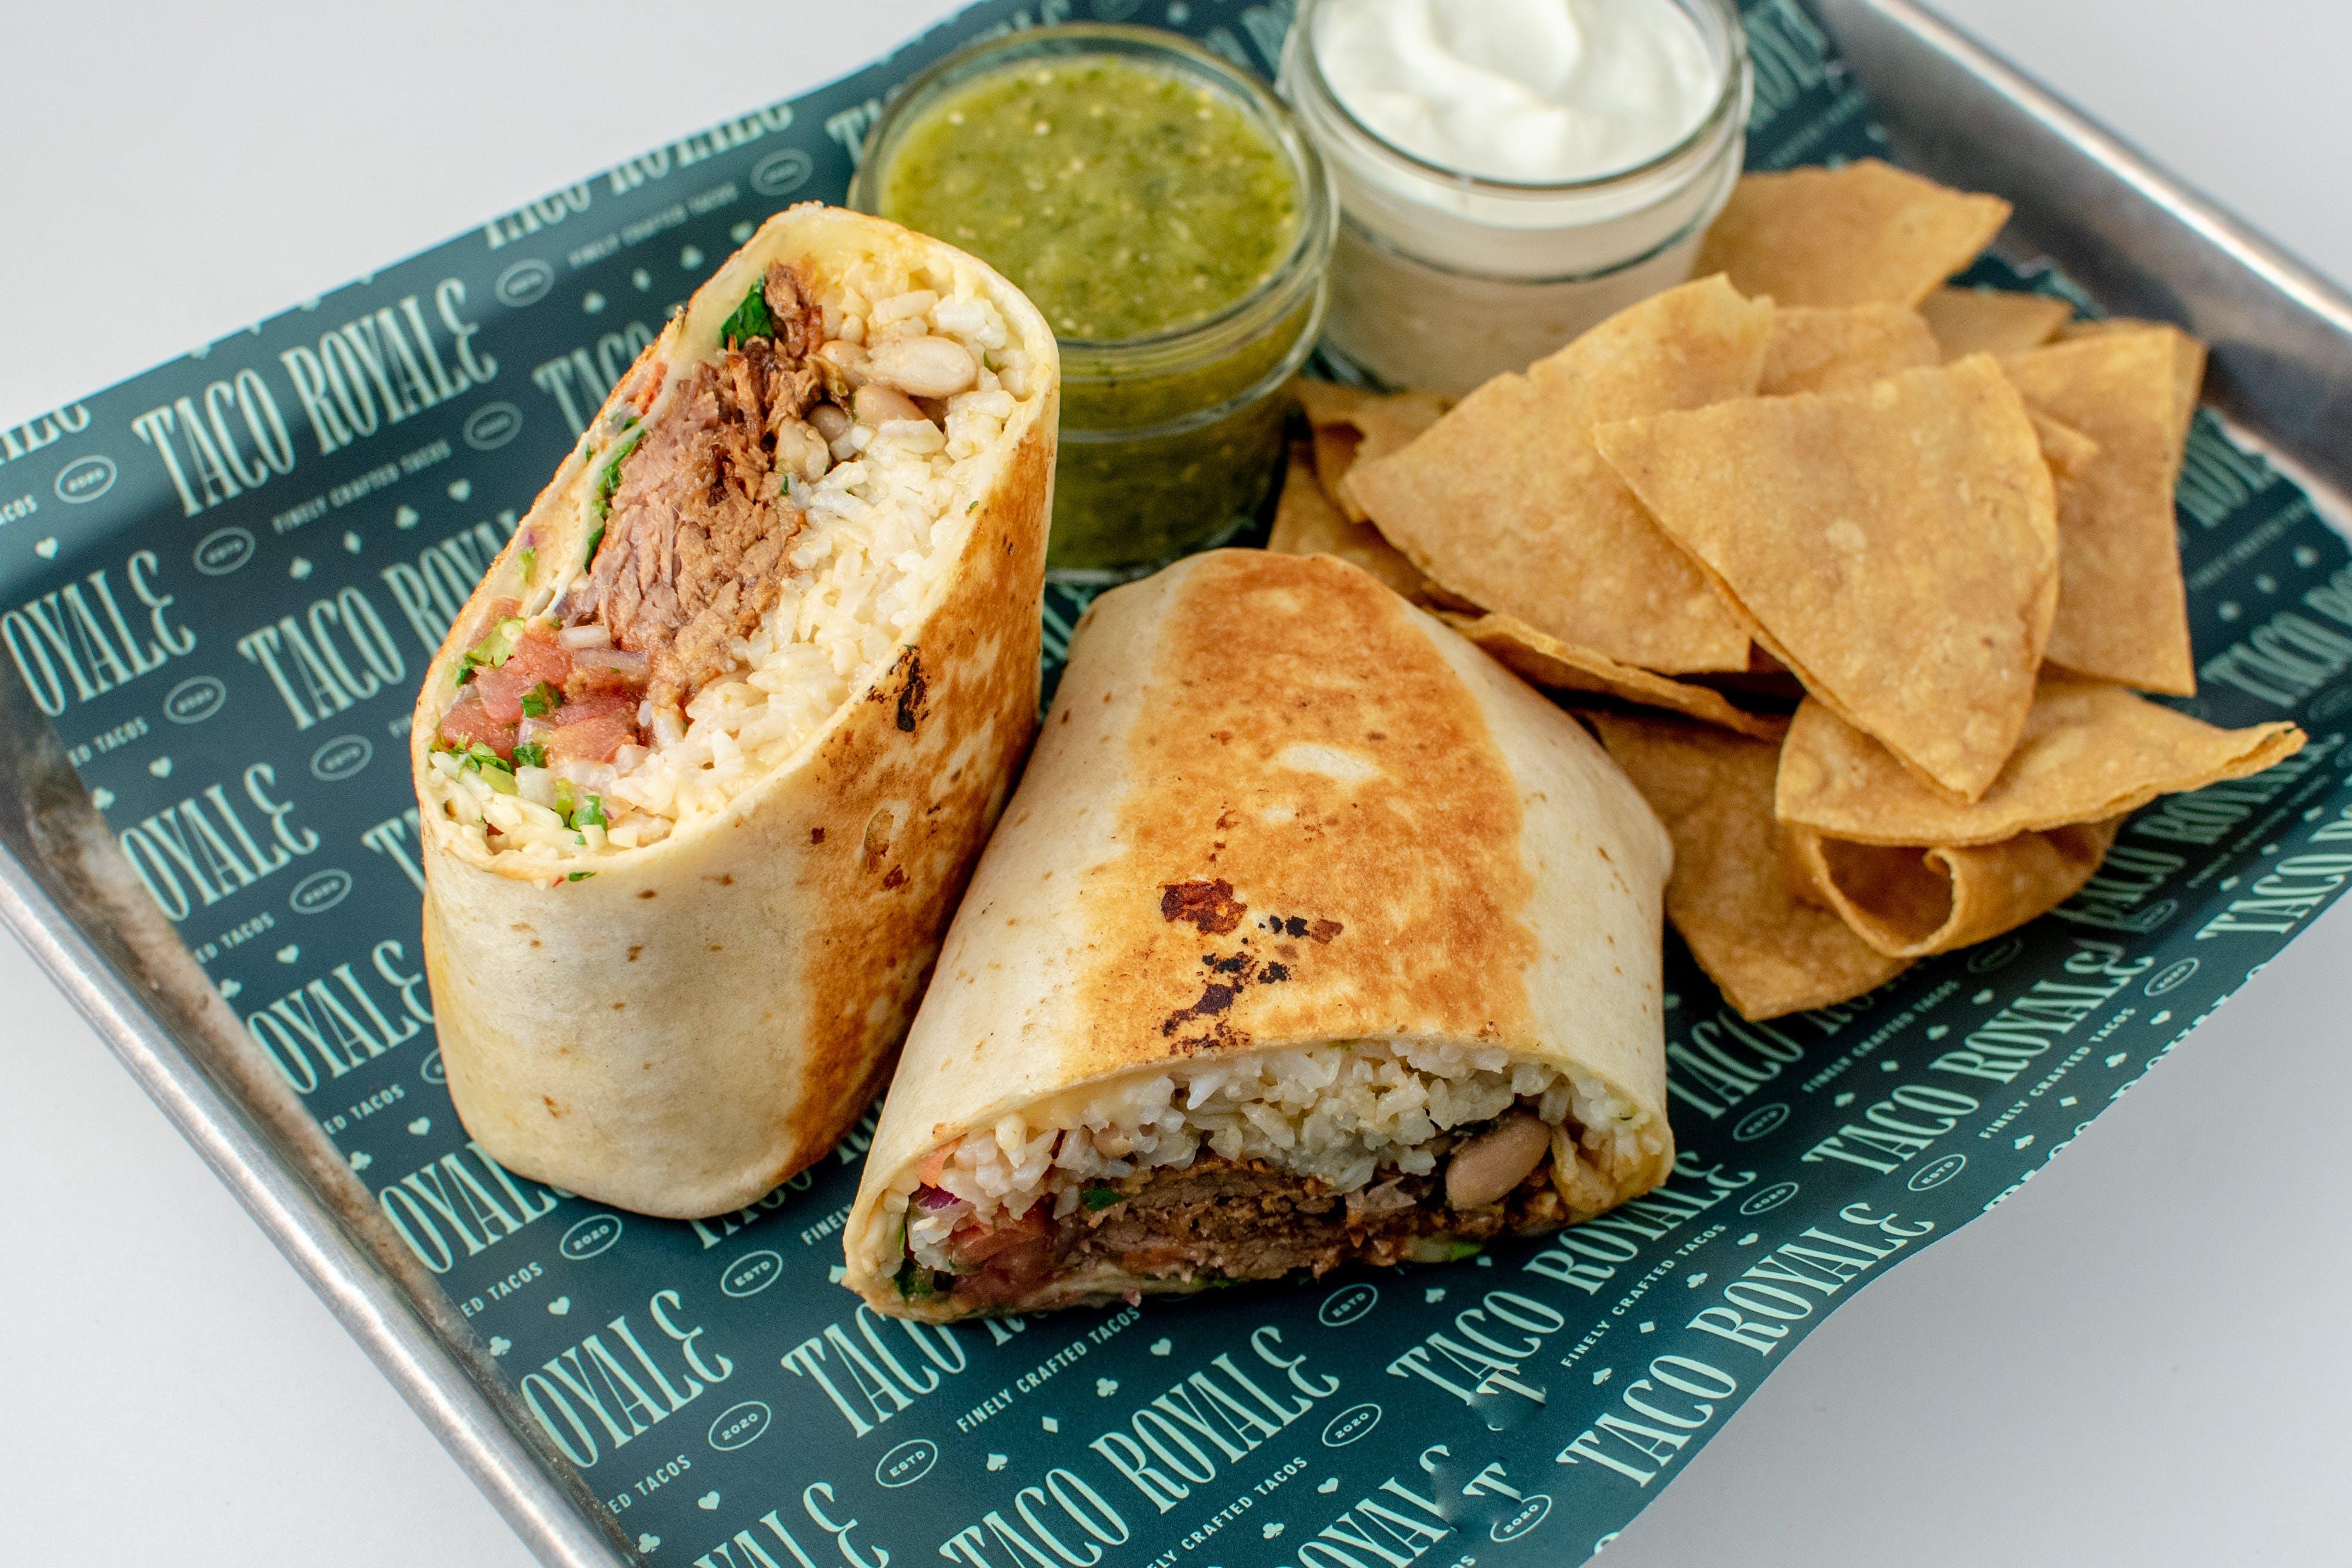 Burrito Combo Meal from Taco Royale - University Ave in Cedar Falls, IA